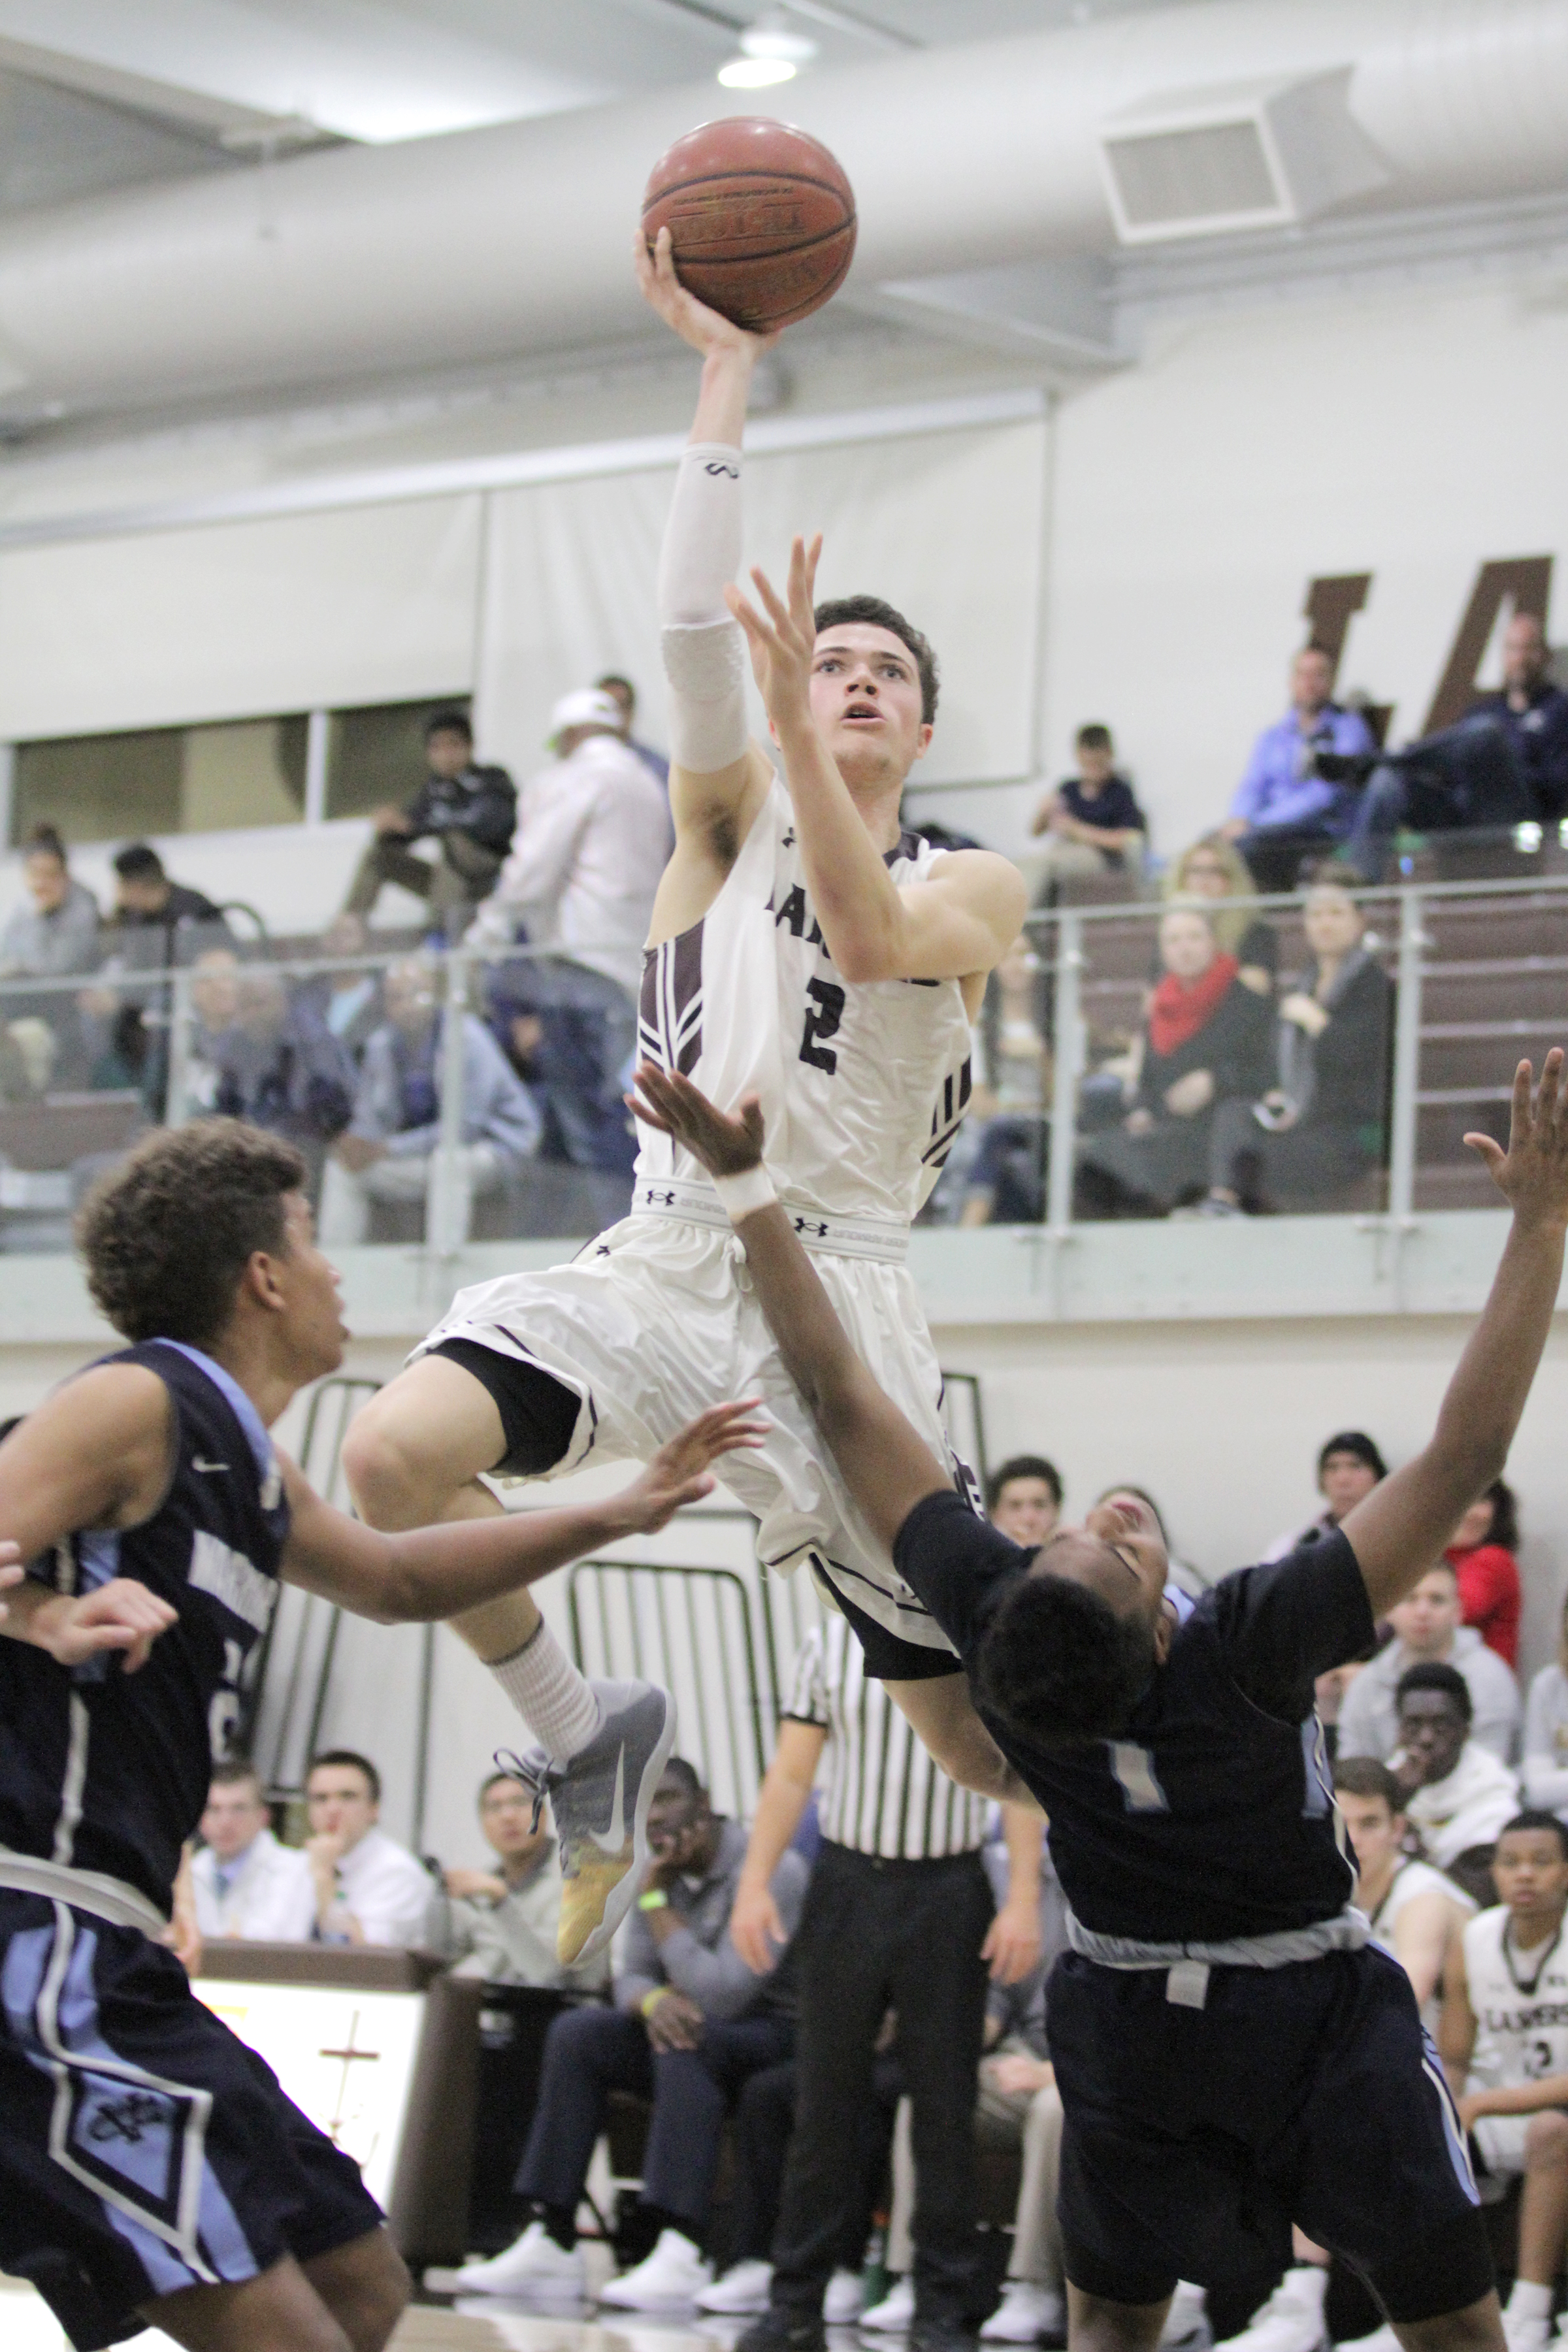 St. Francis High School basketball